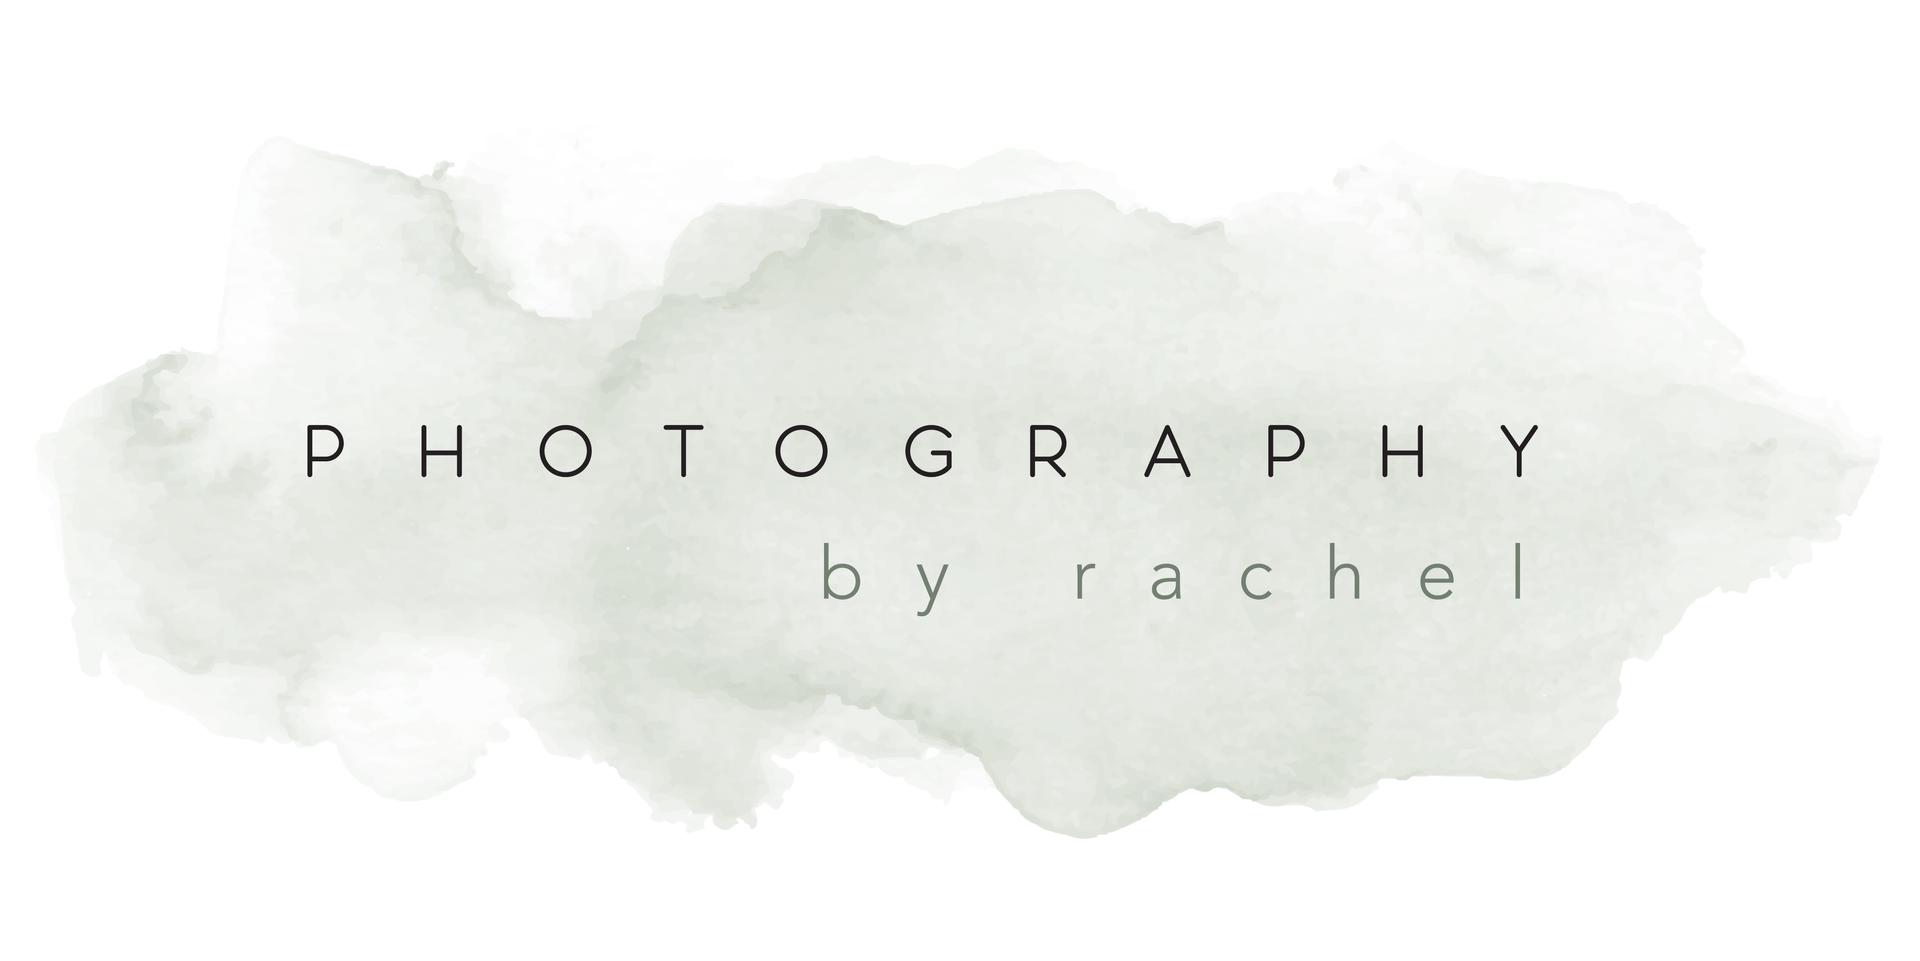 Photography by Rachel Branding | Brand Identity Design by Fresh Leaf Creative | Dorset Brand Designer & Photographer